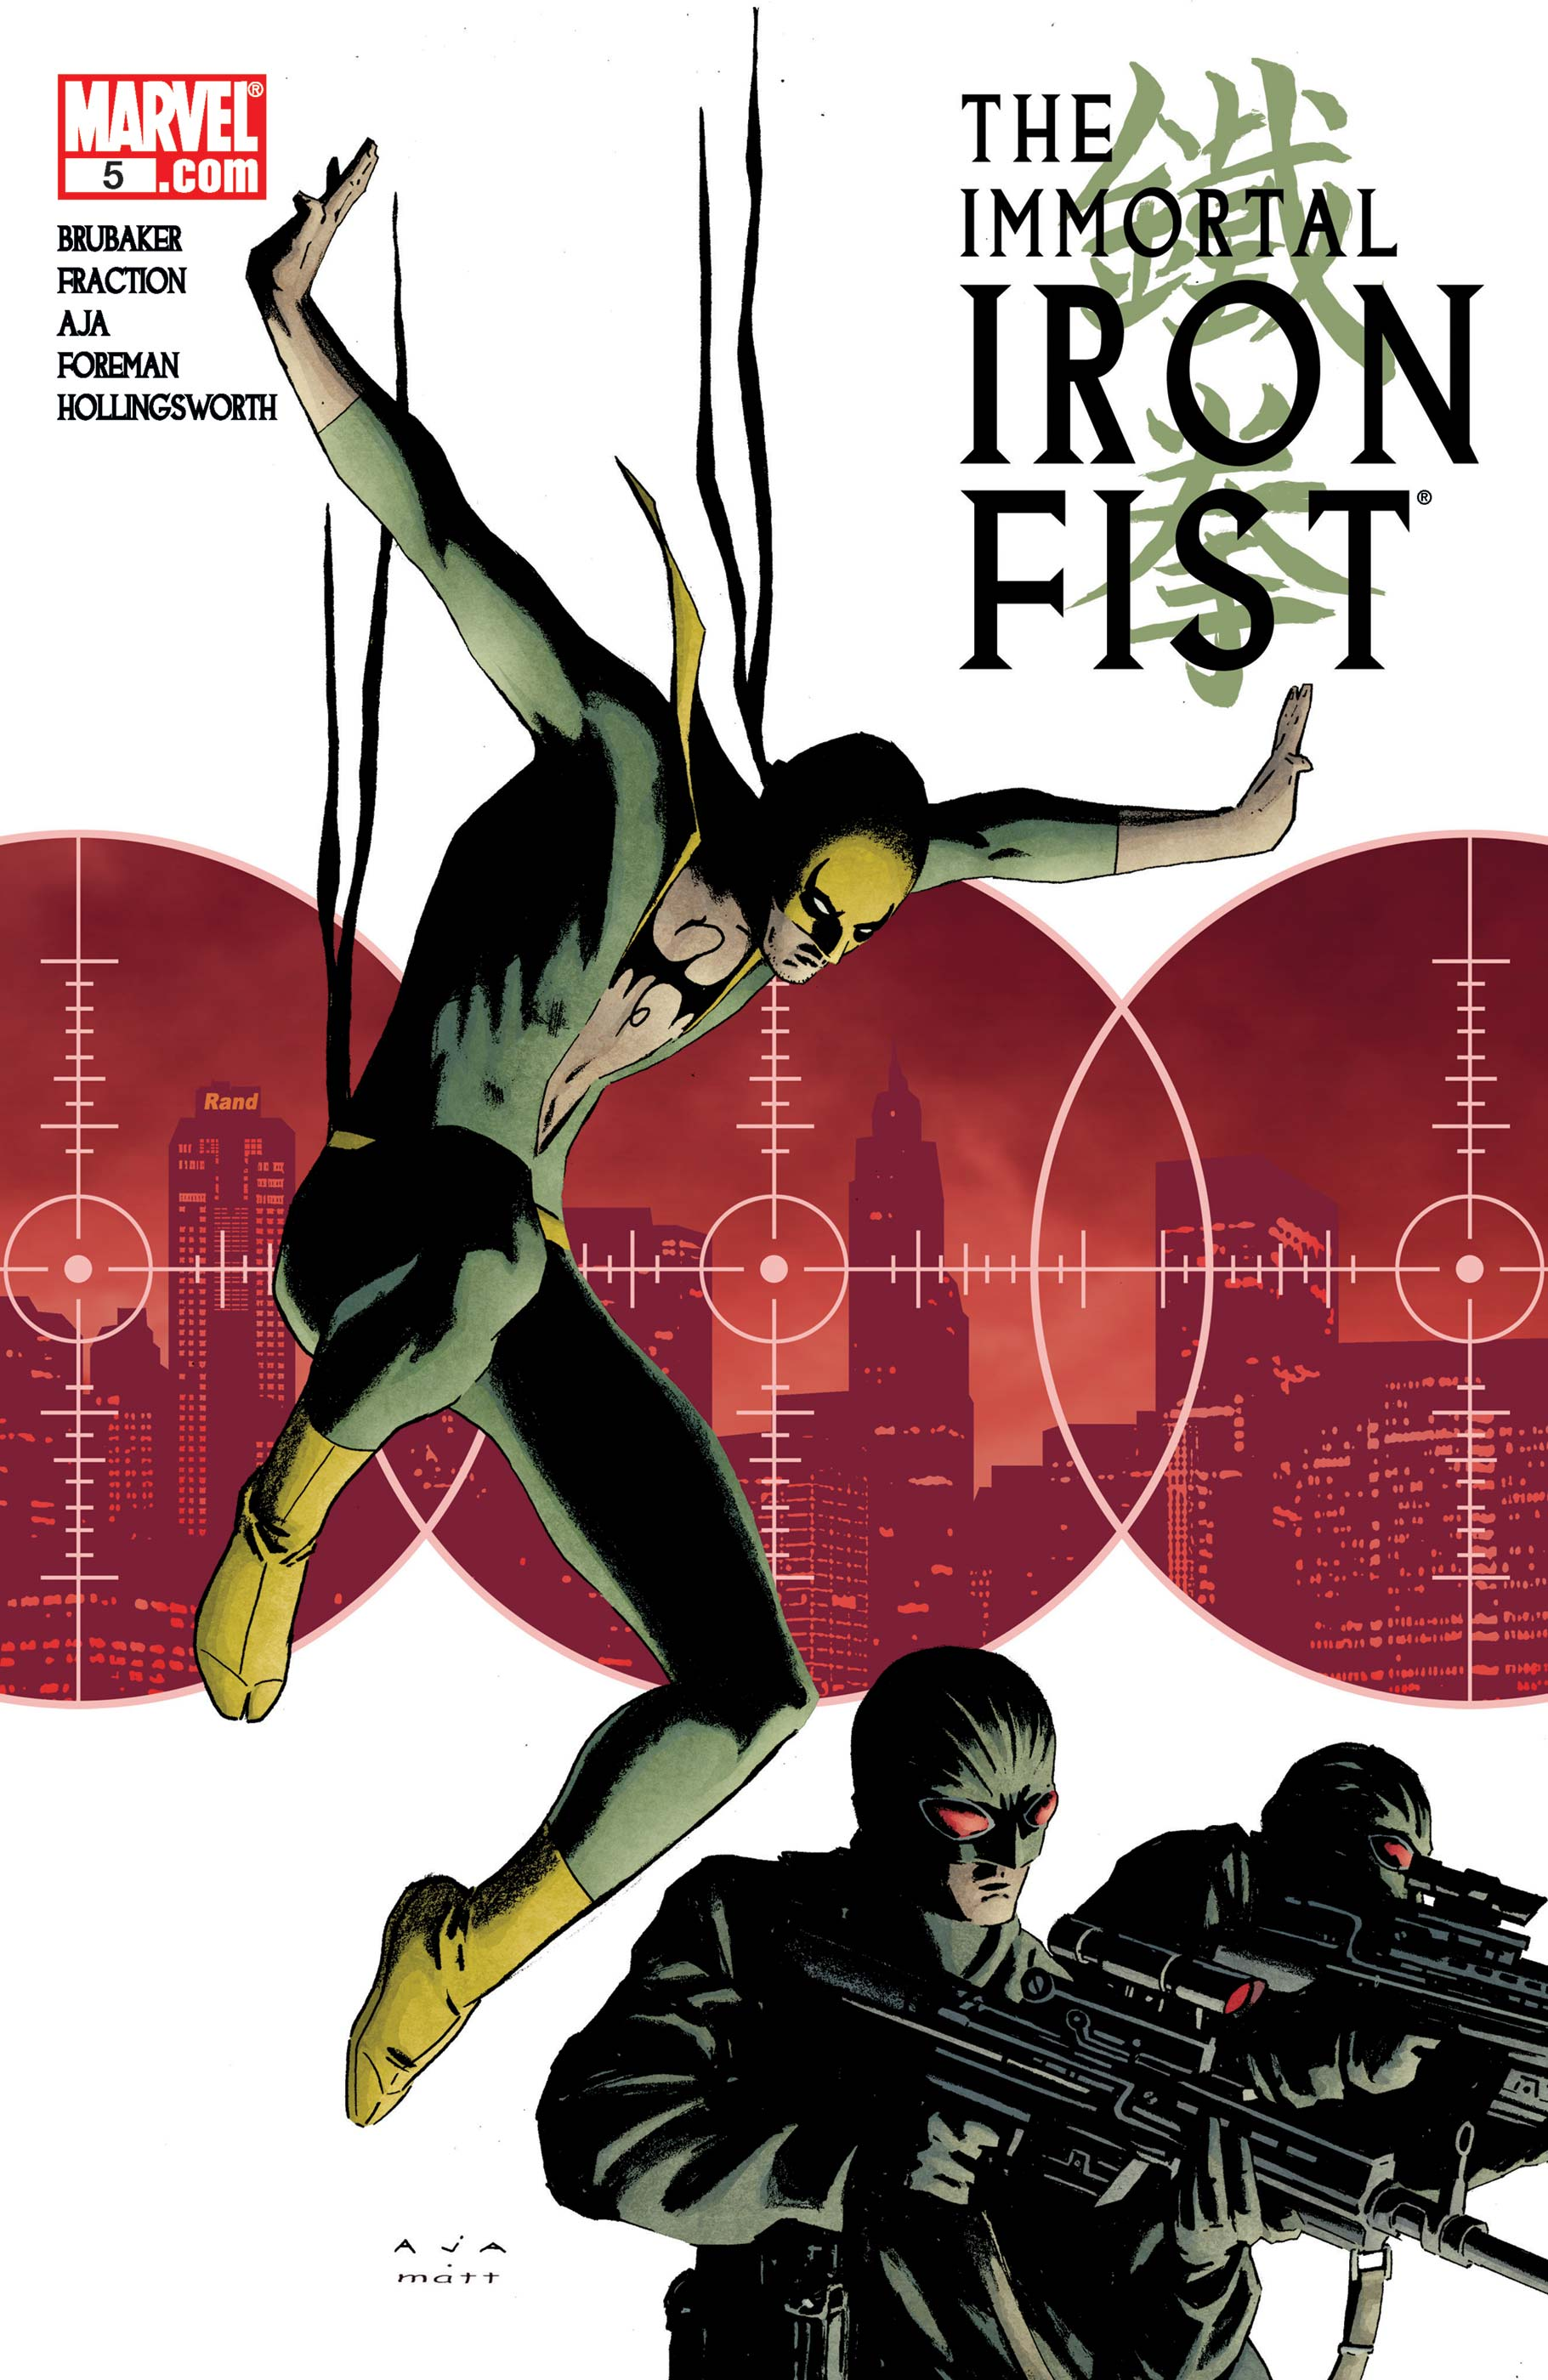 The Immortal Iron Fist (2006) #5